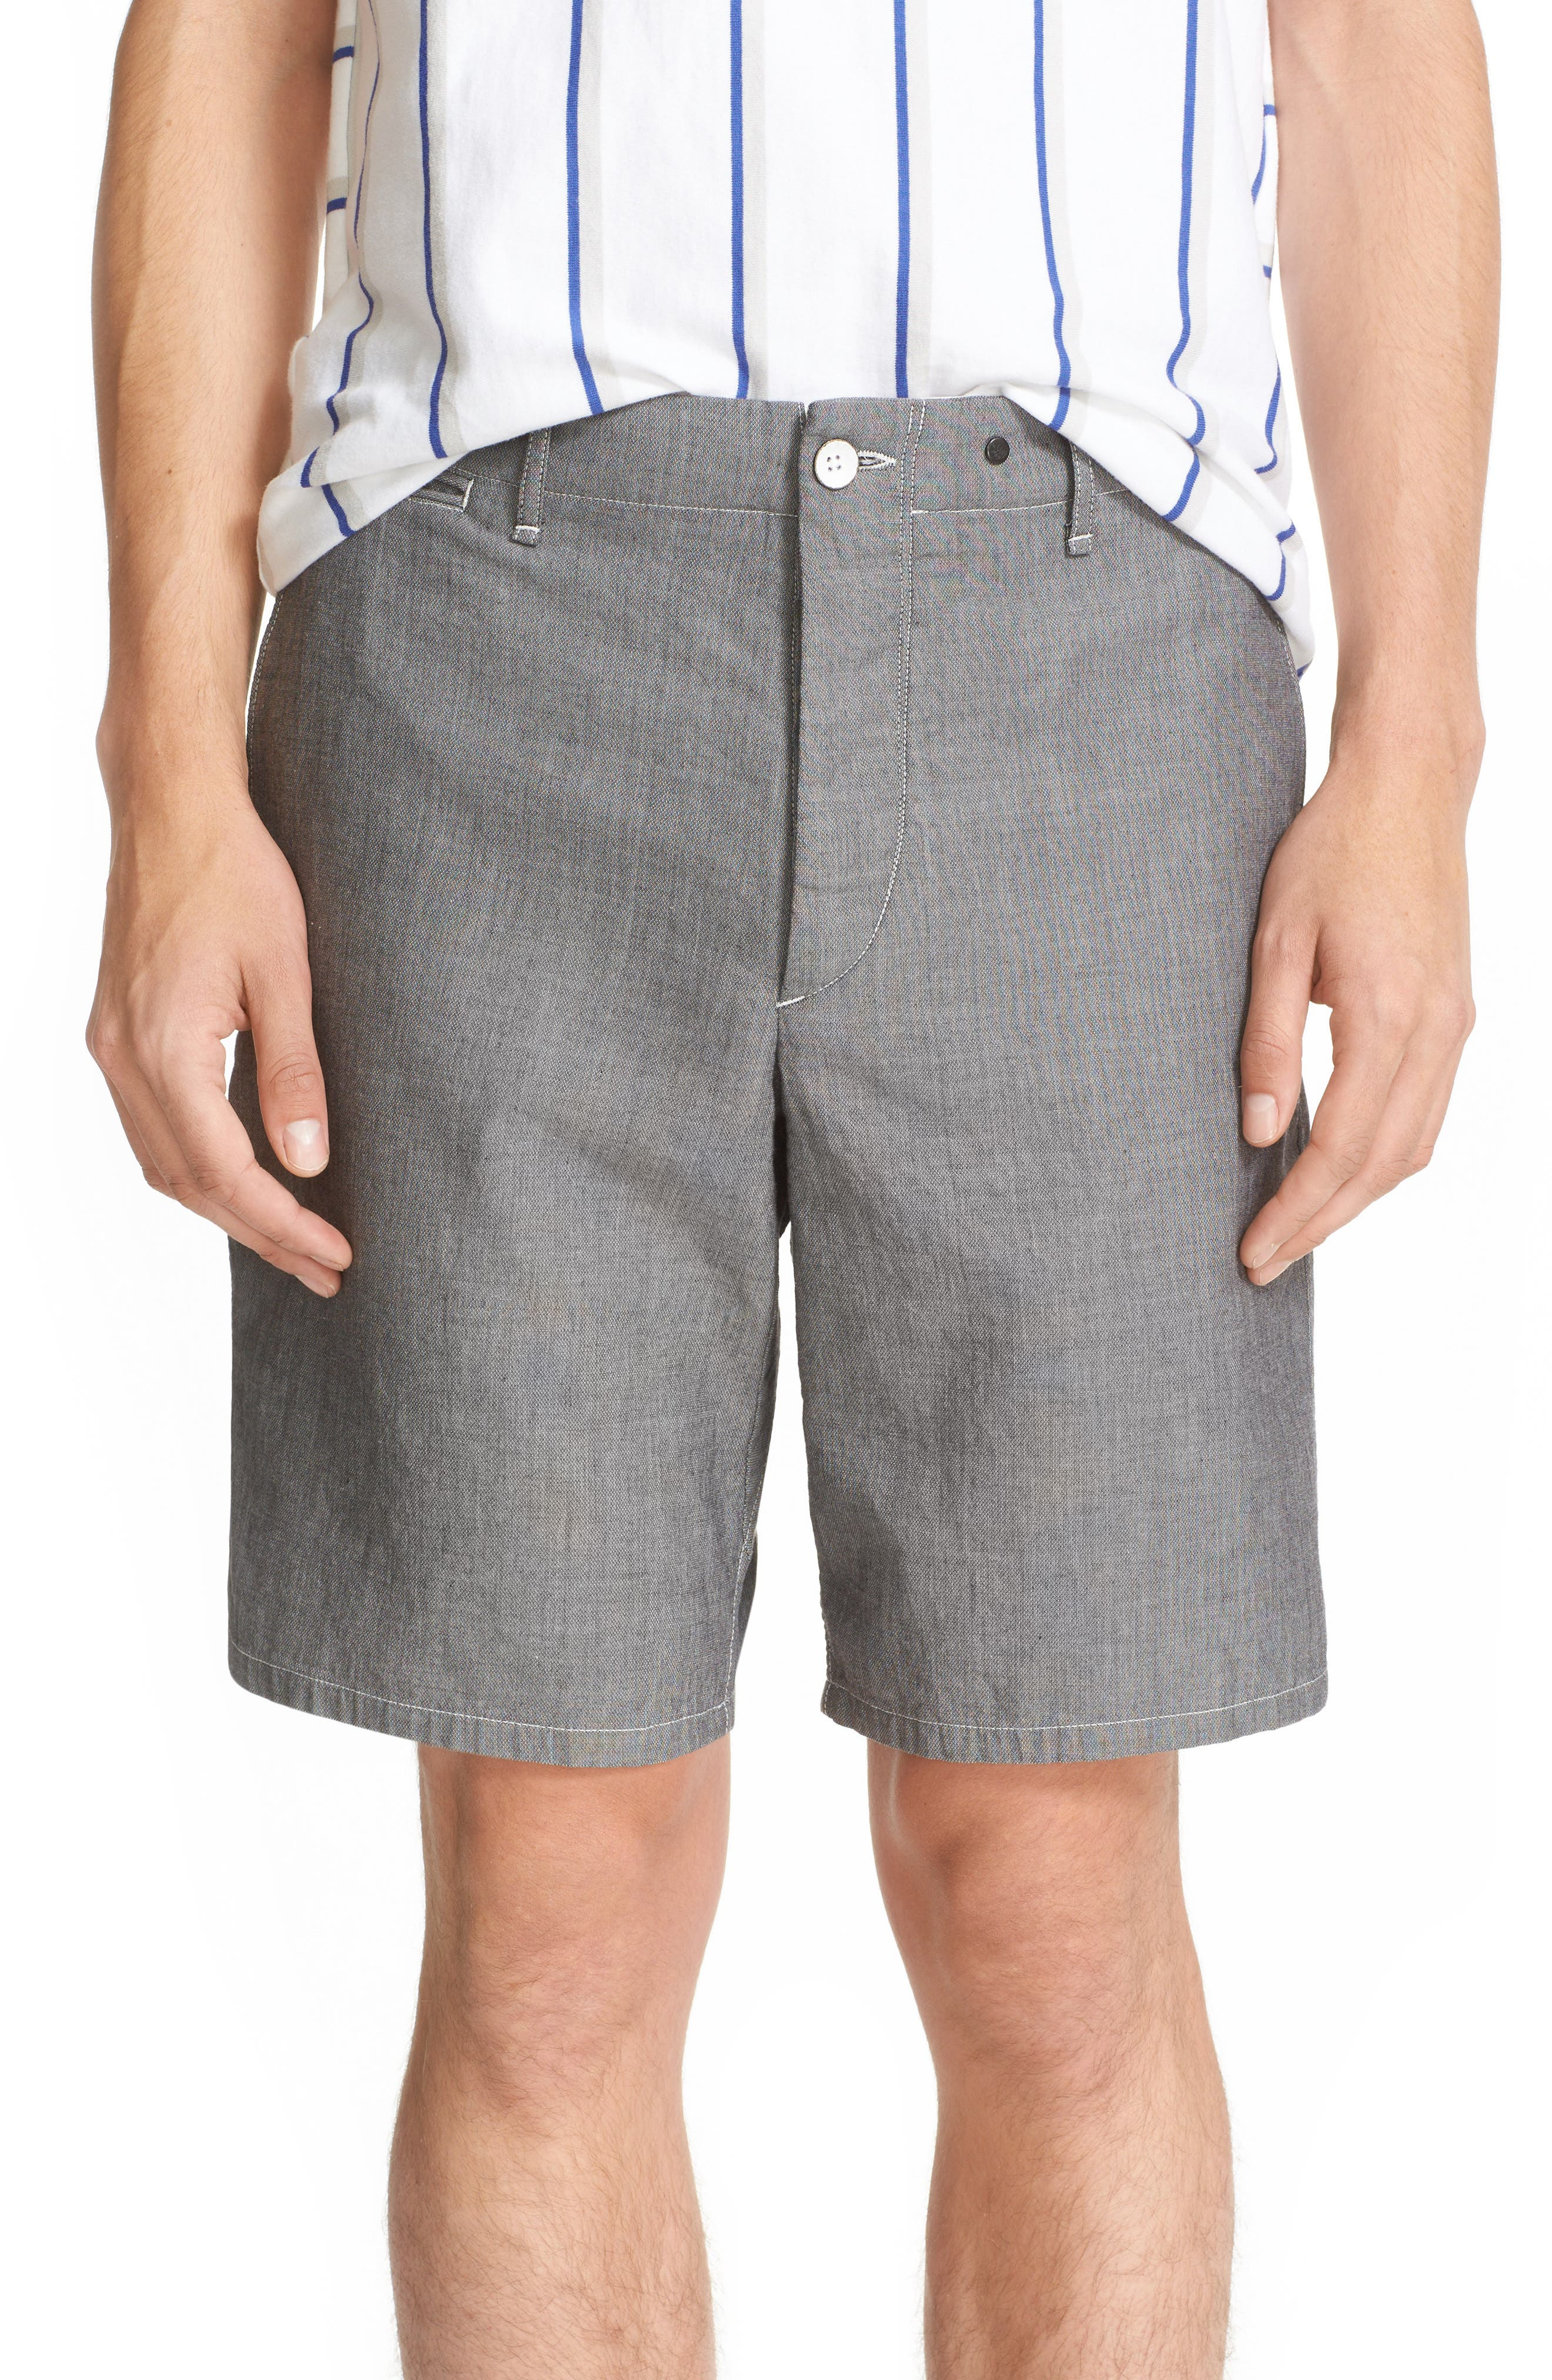 Beach II Shorts,                             Main thumbnail 1, color,                             001